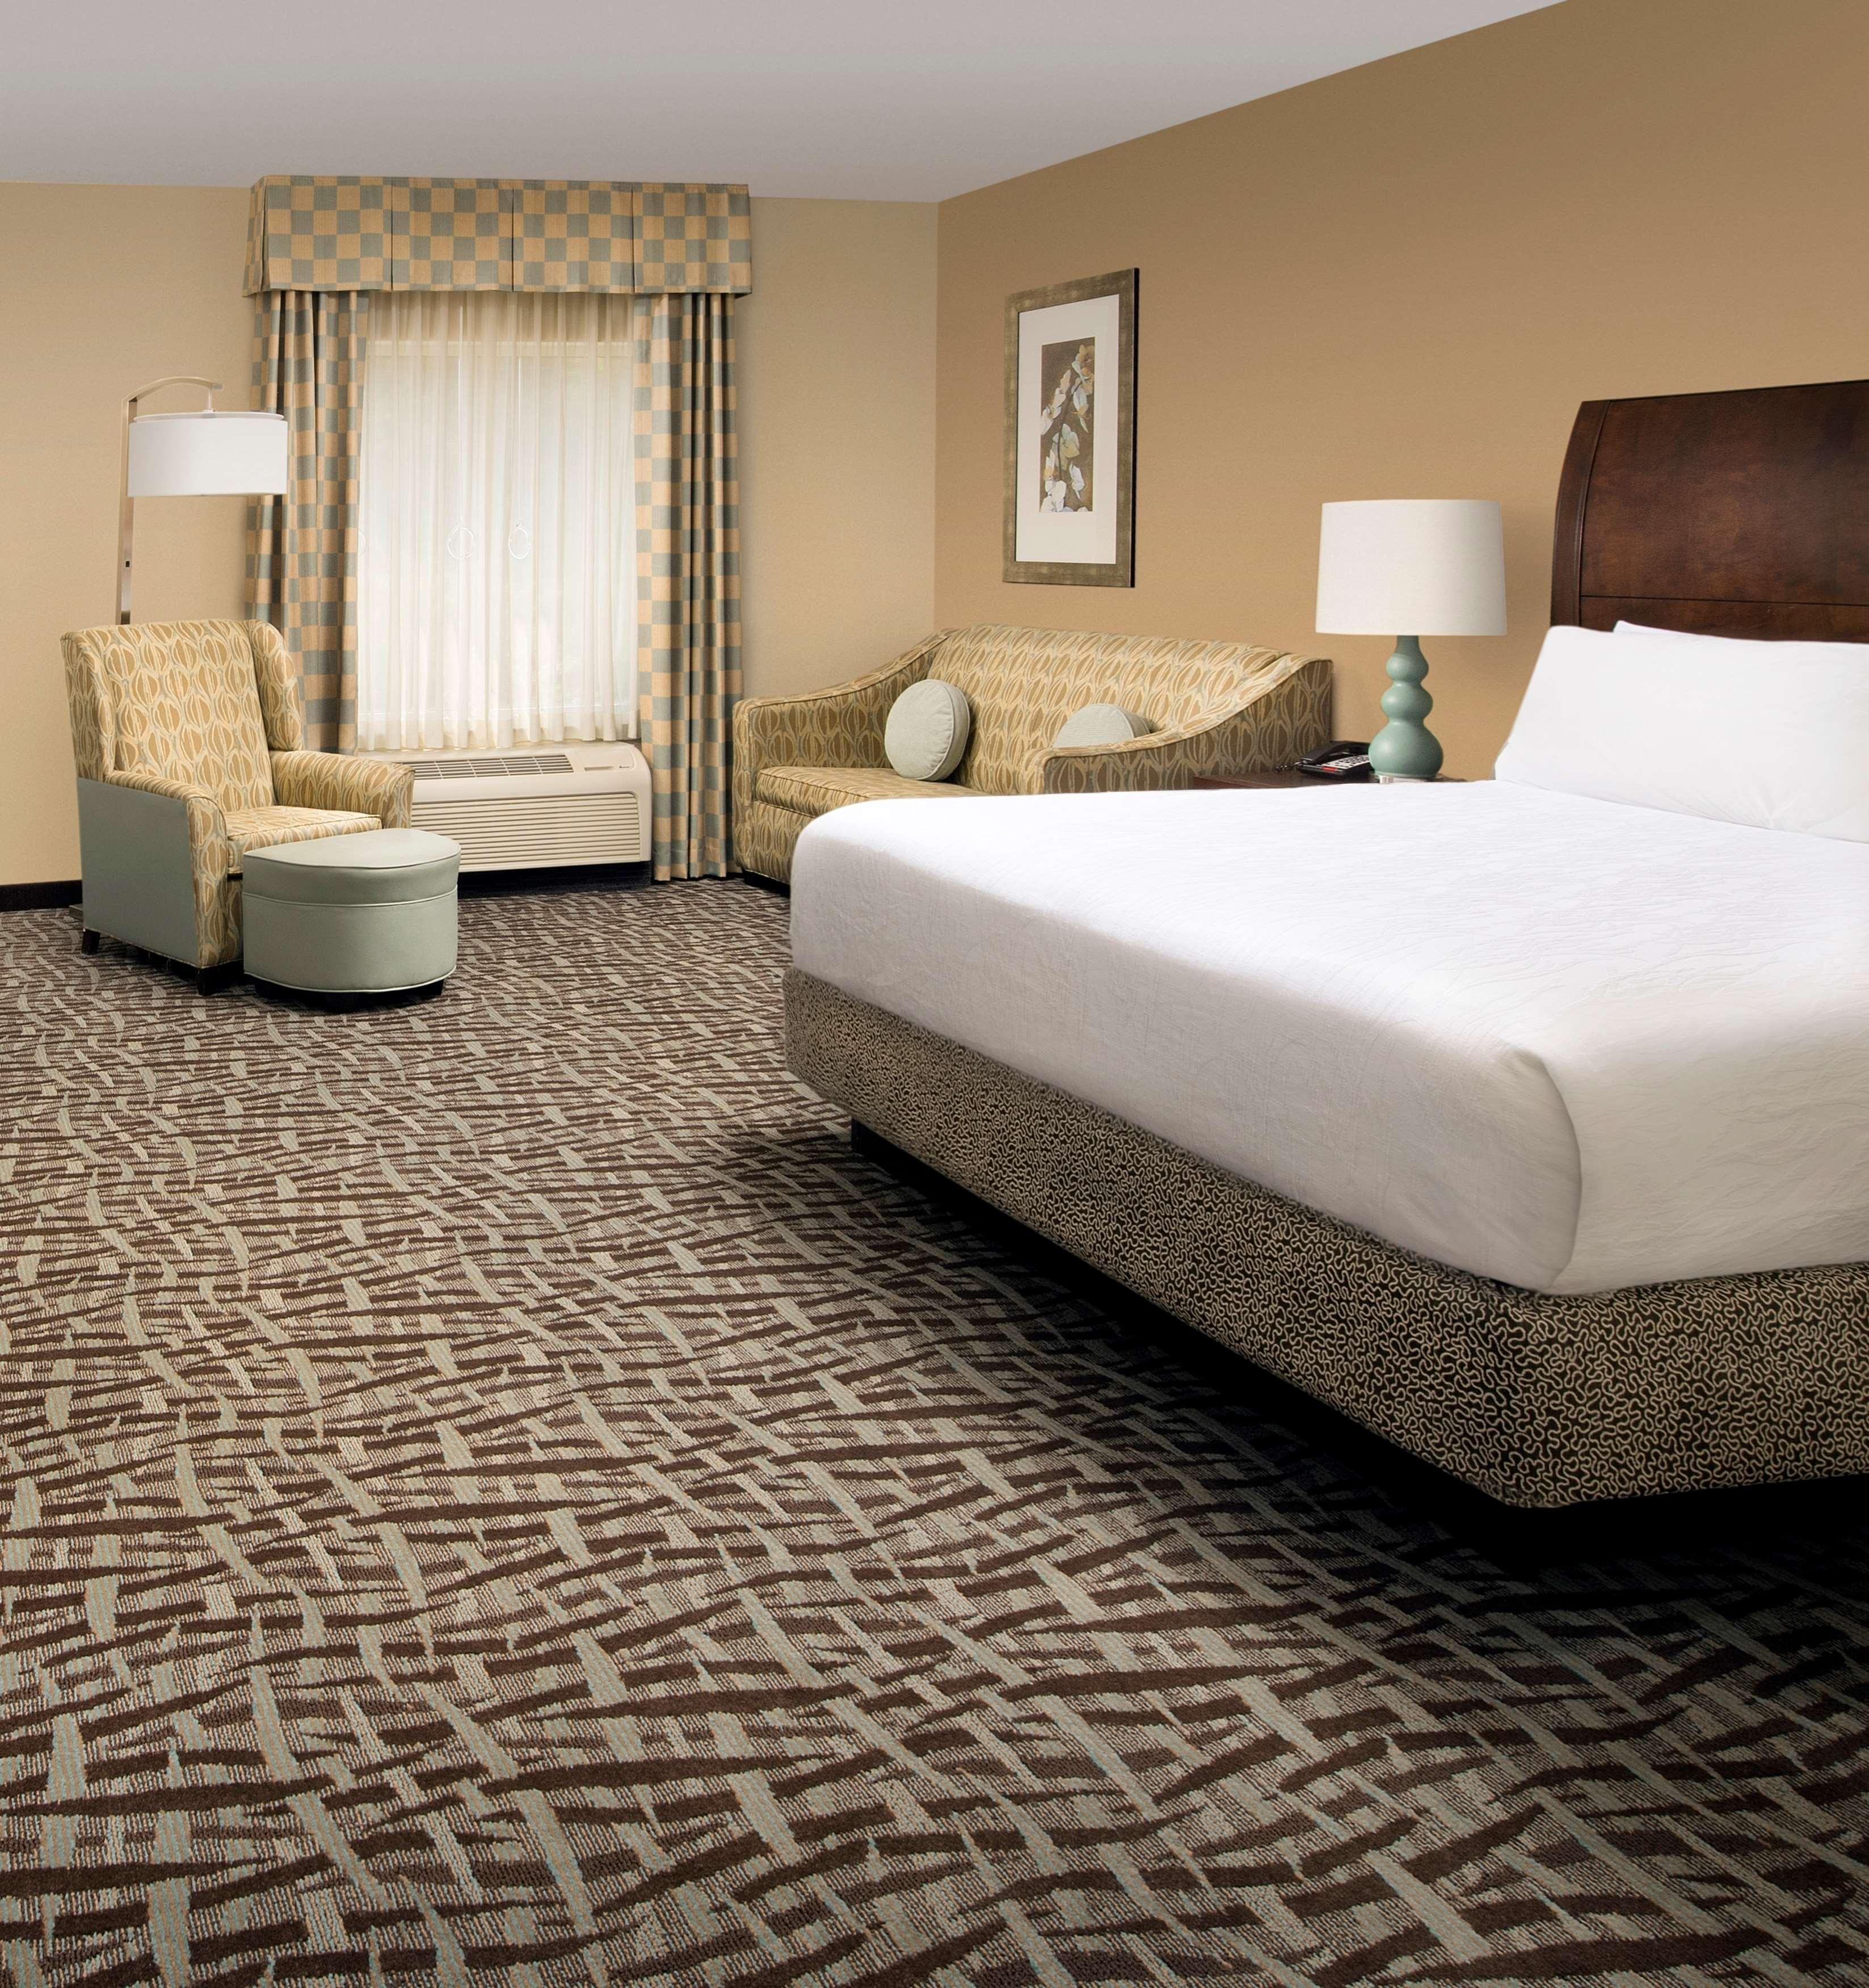 Hilton Garden Inn Winston-Salem/Hanes Mall image 24